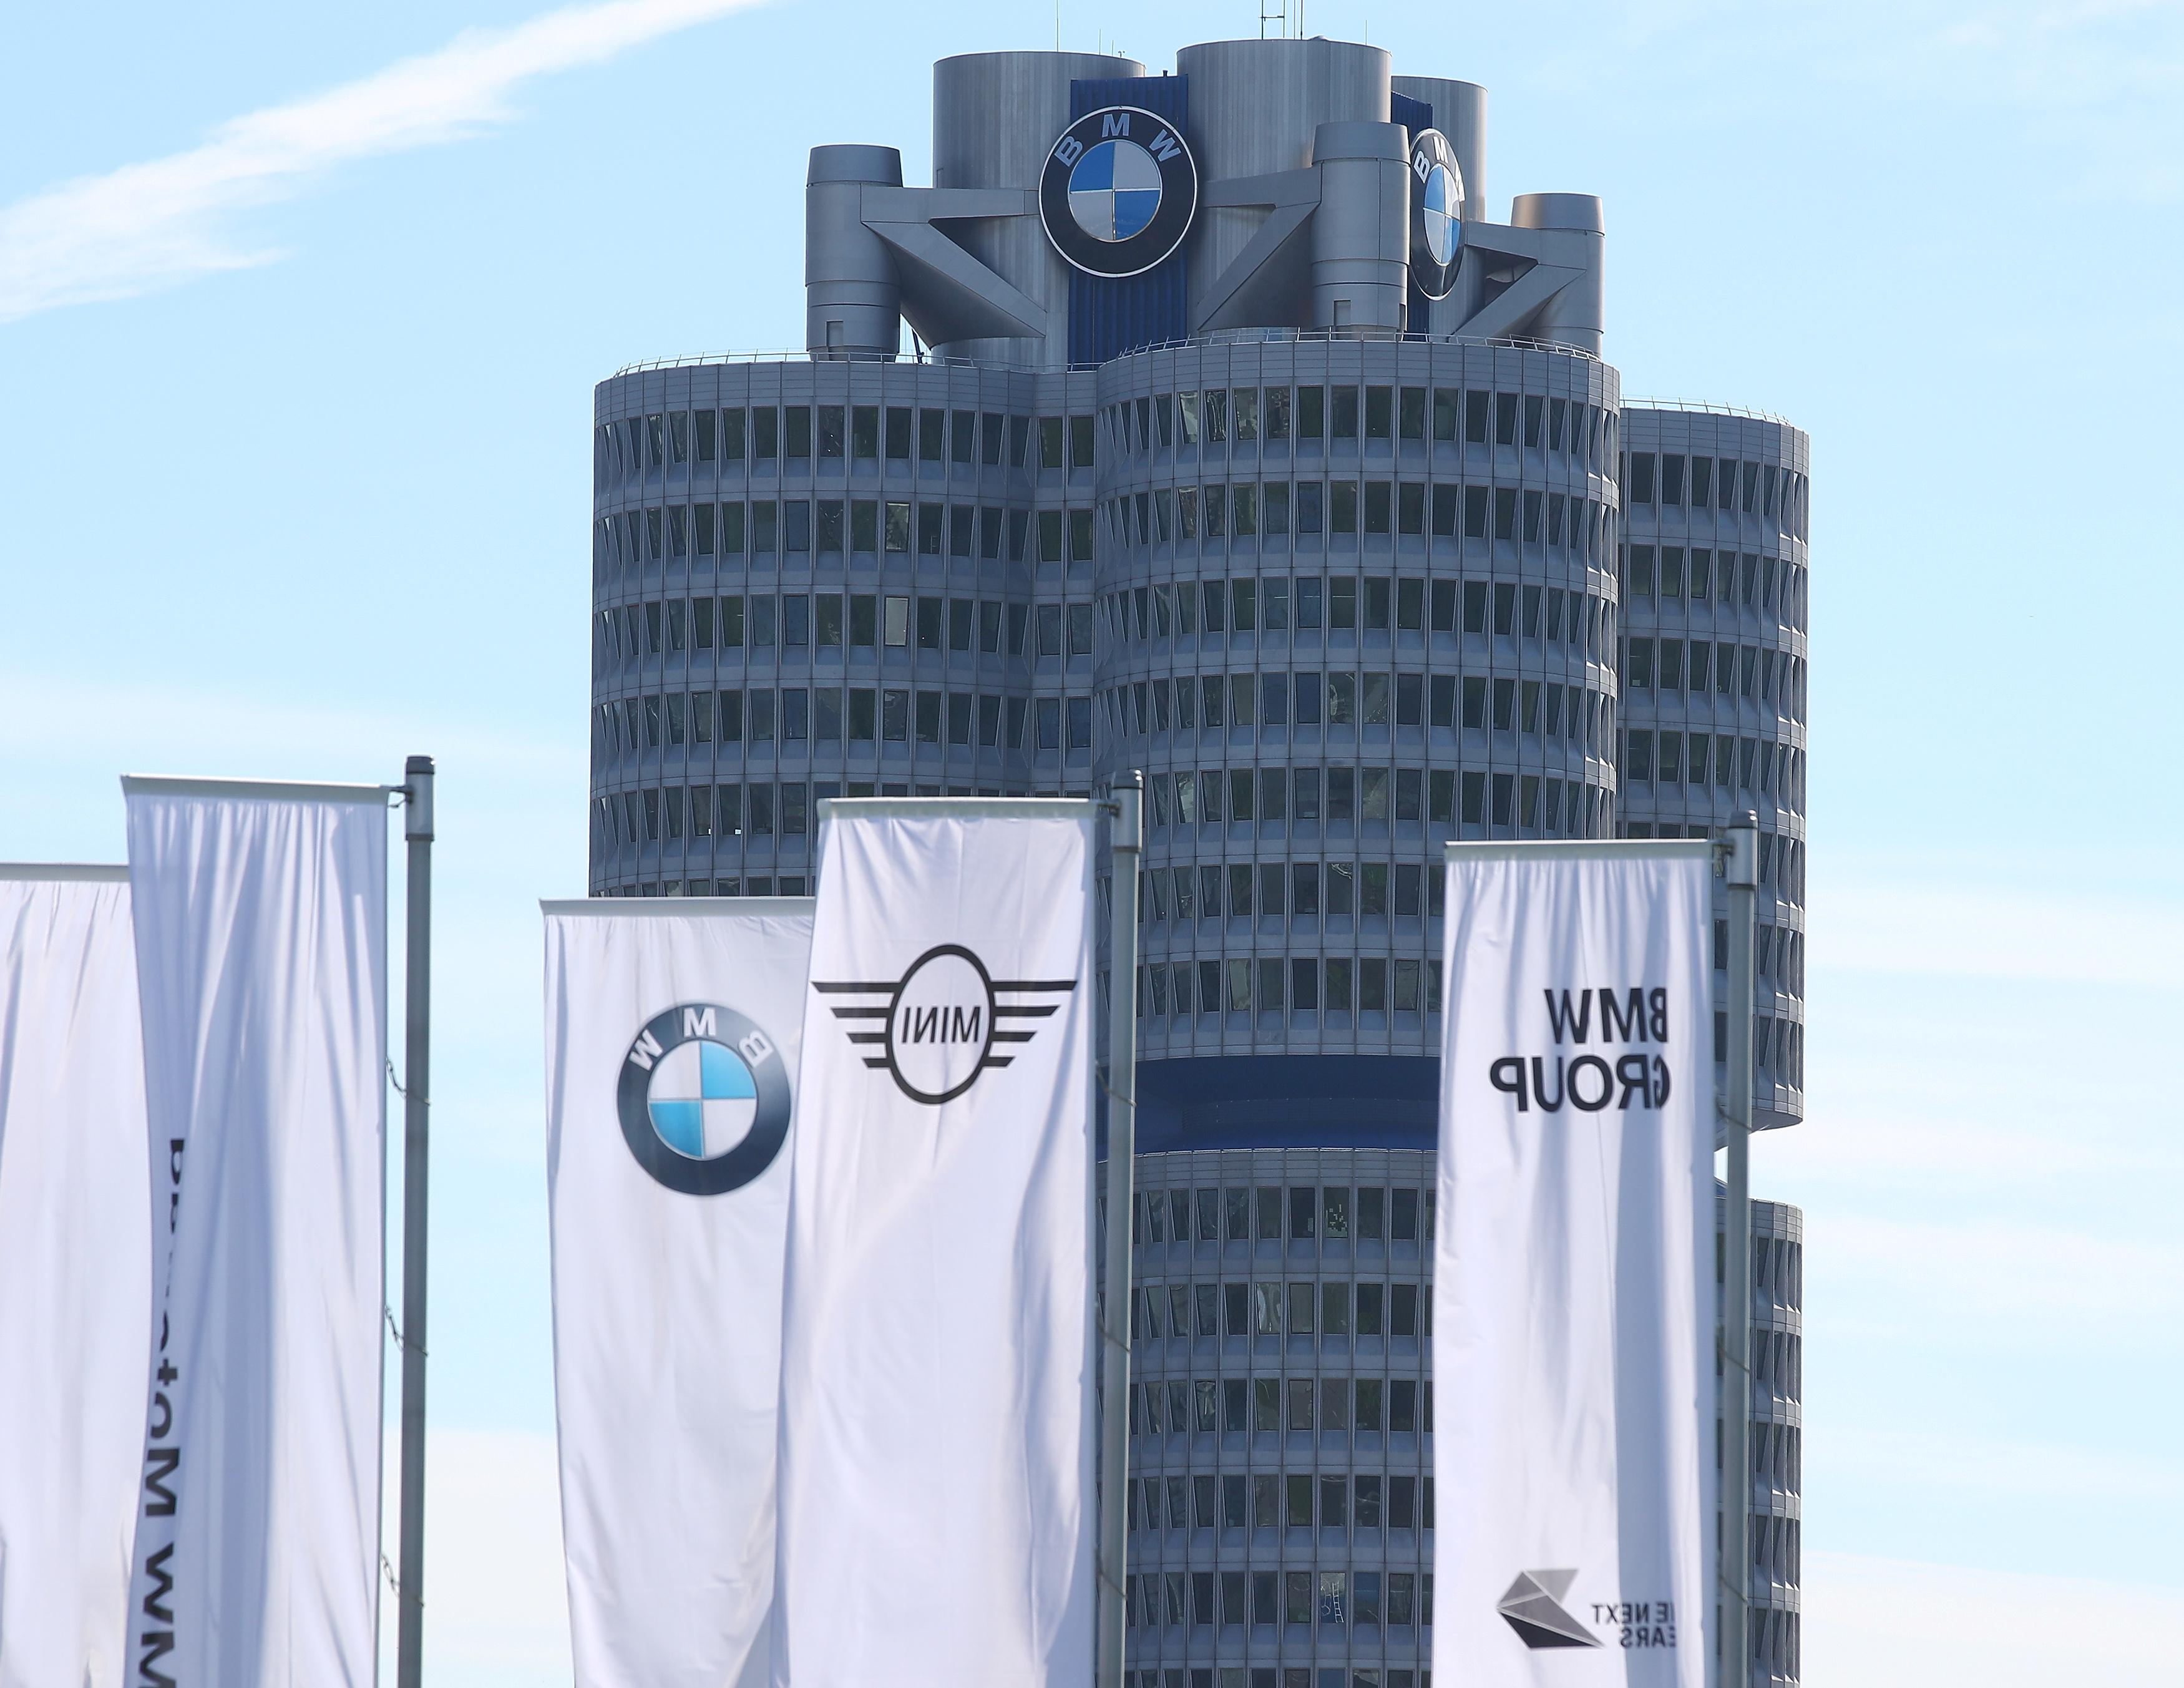 Središnja zgrada BMW-a u Münchenu